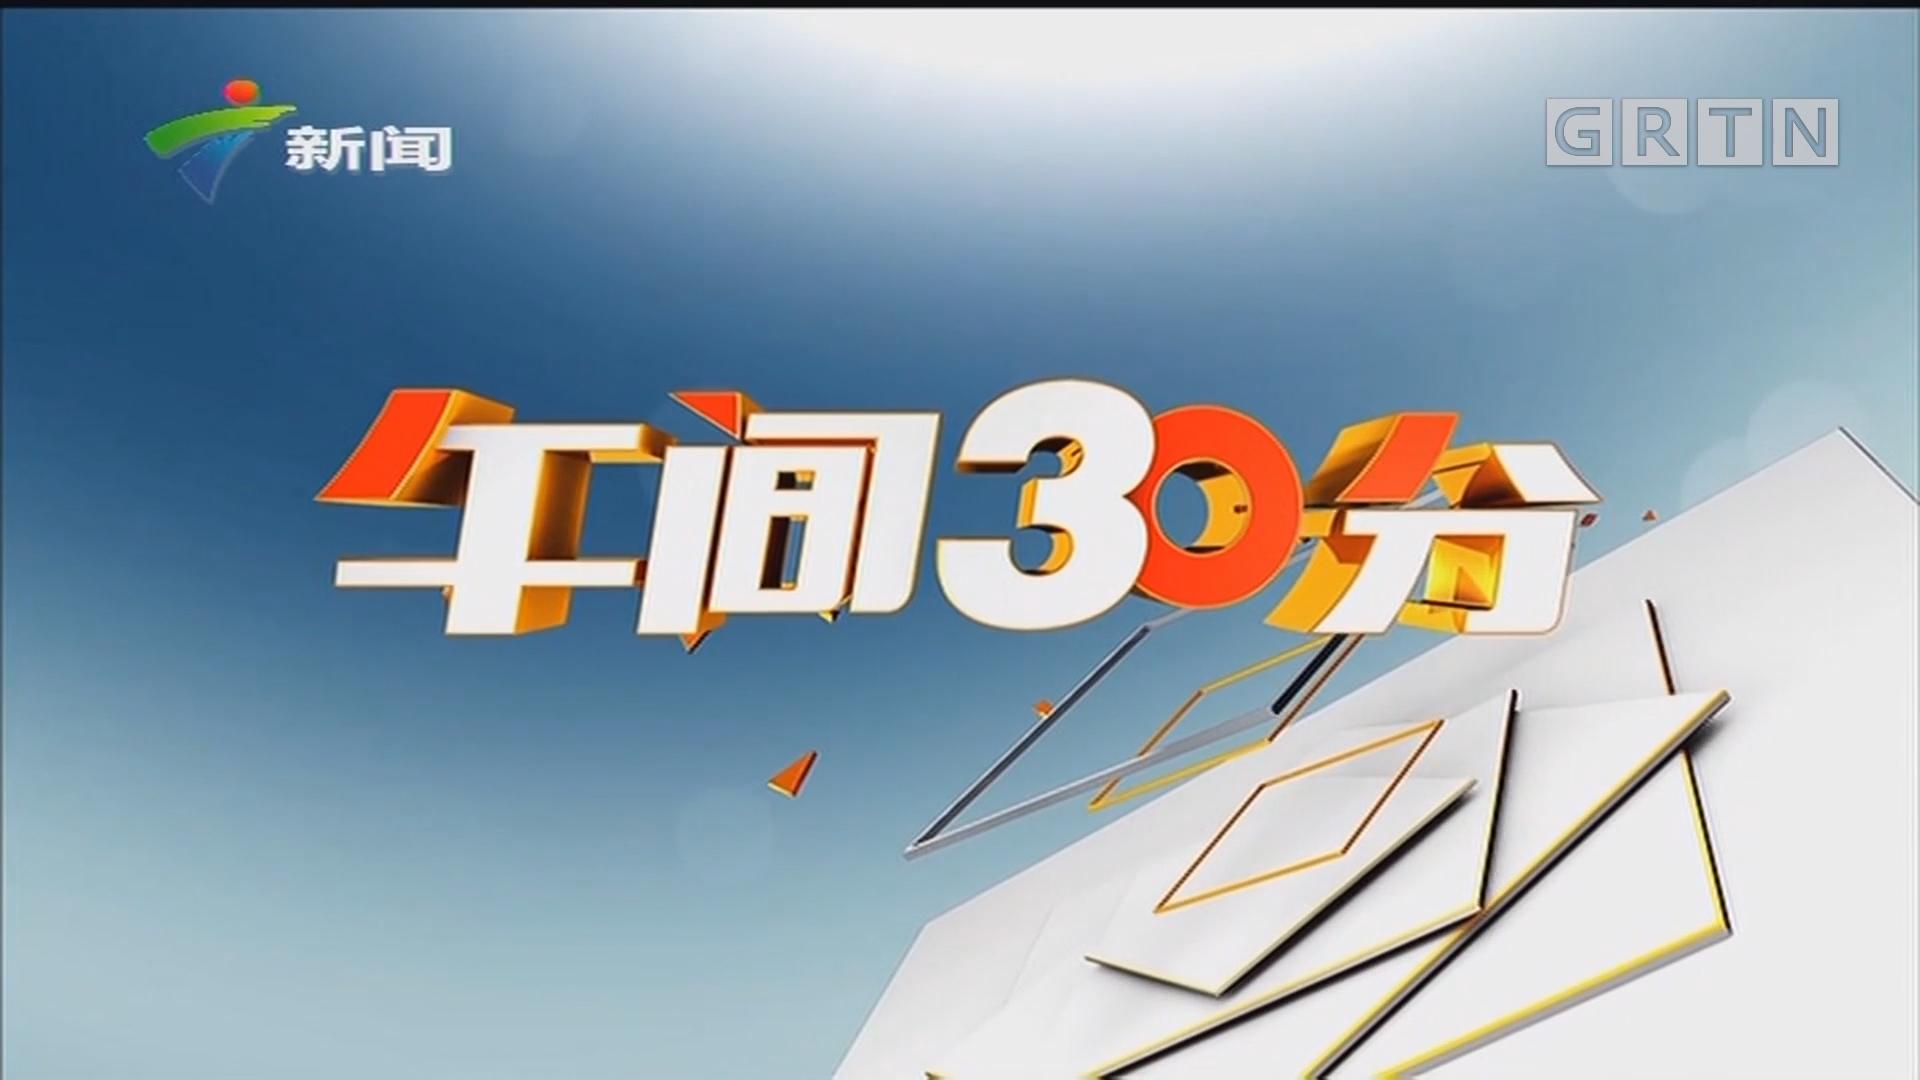 [HD][2019-10-13]午间30分:广西玉林发生5.2级地震 广西manbetx手机版 - 登陆多地有震感